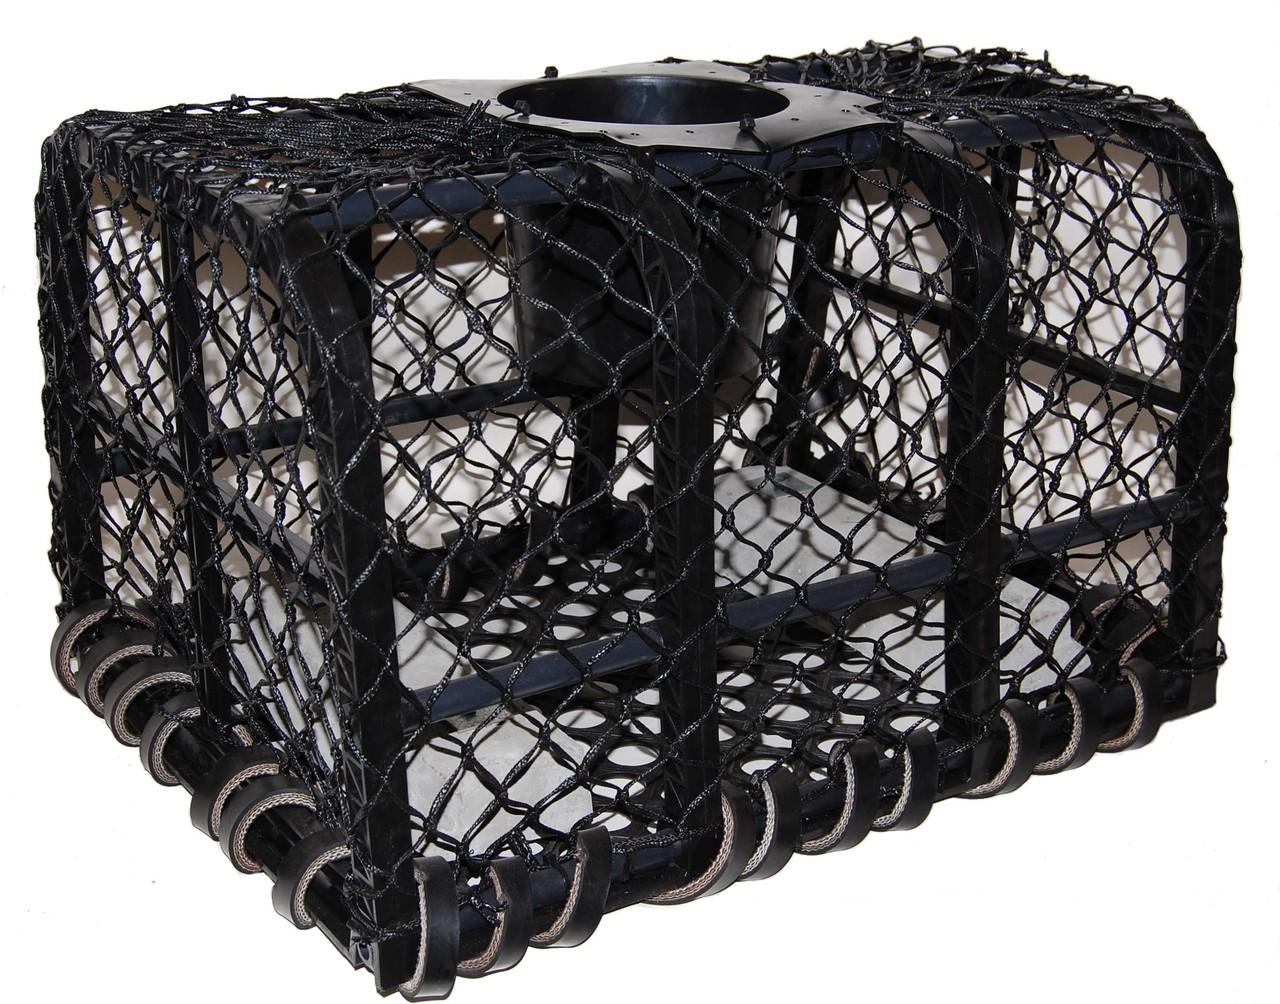 casier peche mer casier pour p che casier a homard casiers crevettes homards nord casier nord. Black Bedroom Furniture Sets. Home Design Ideas